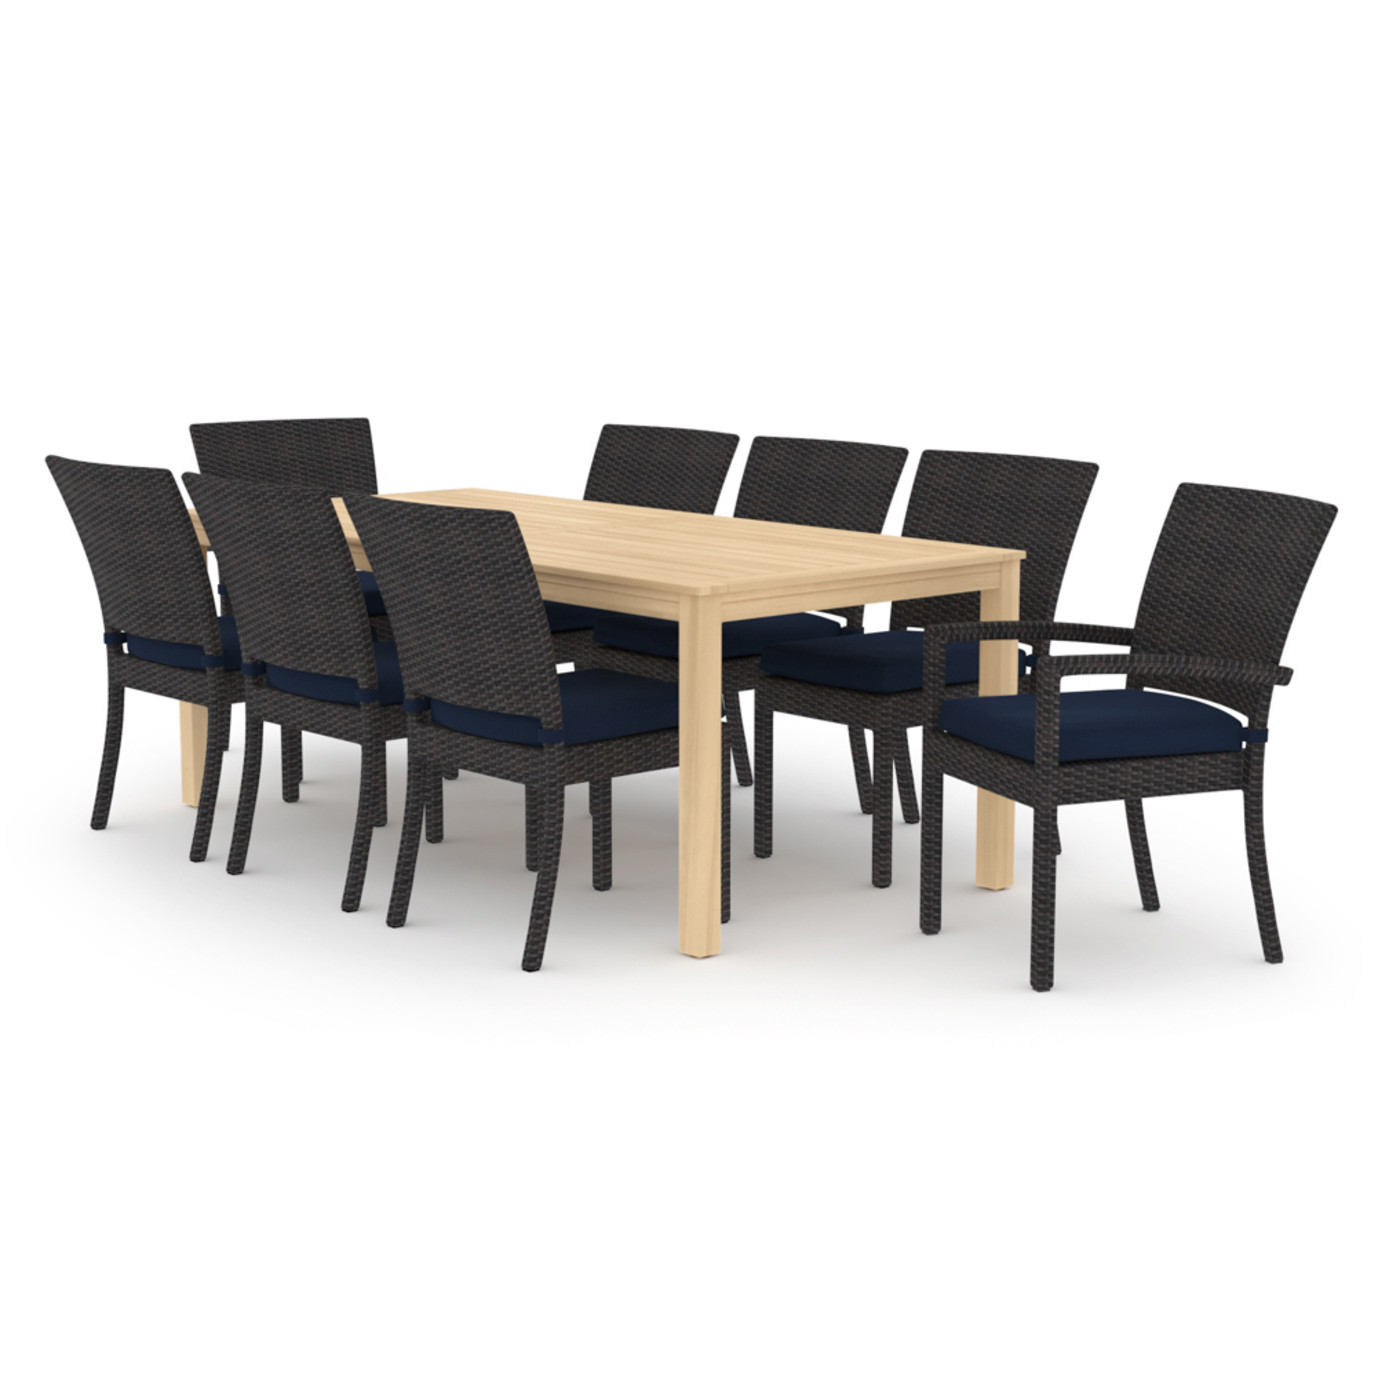 Deco™ Wood 9pc Dining Set